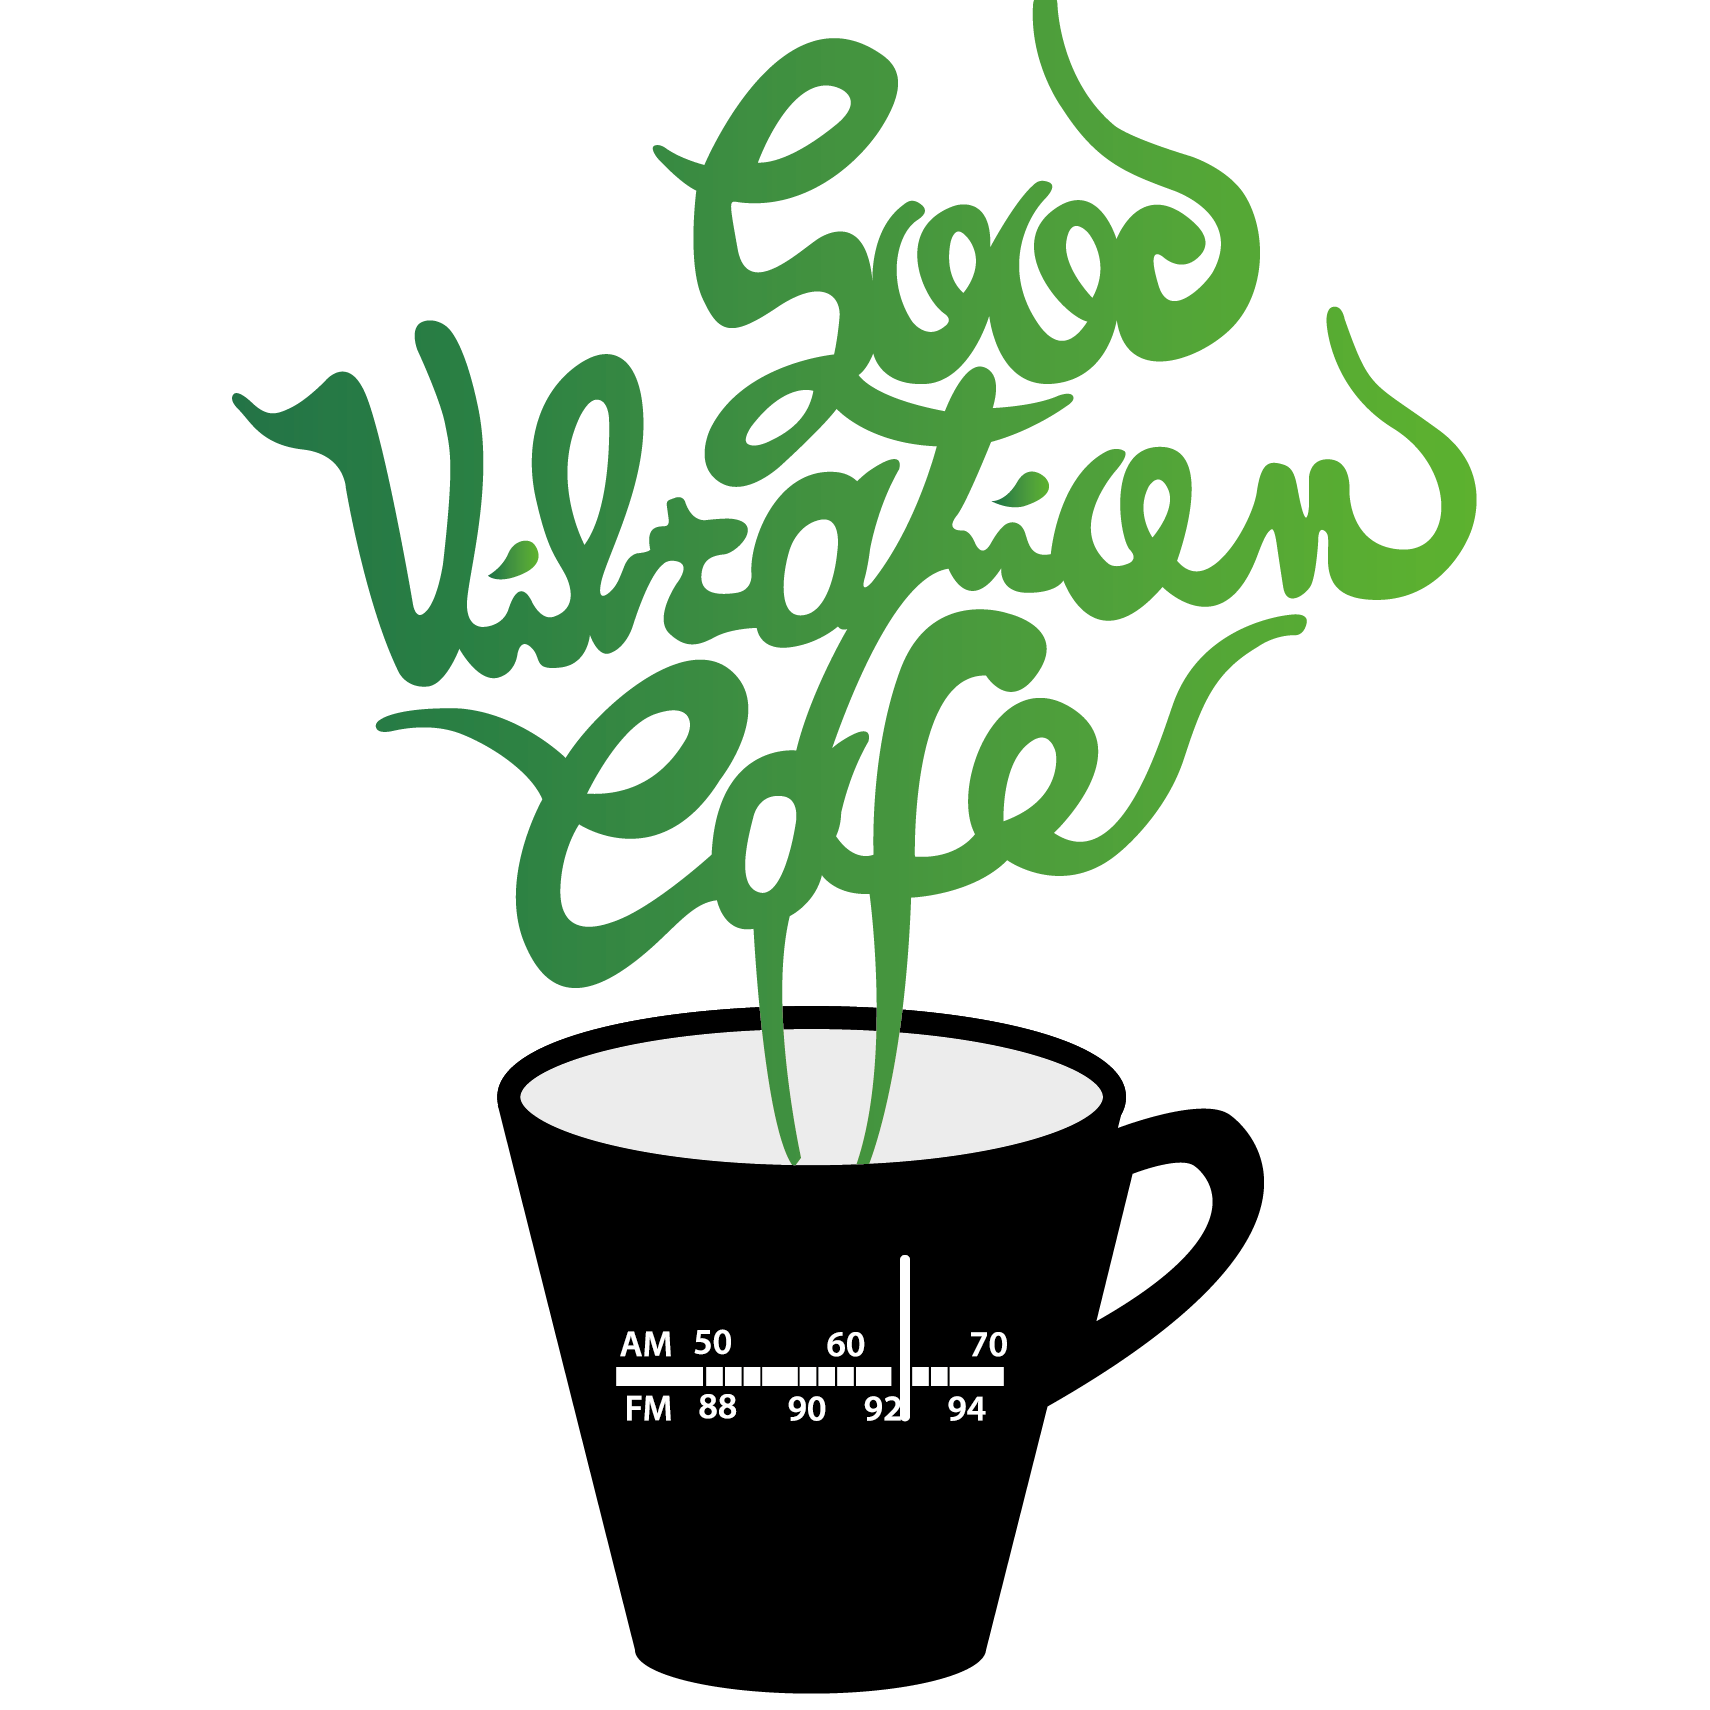 Good Vibration Cafè